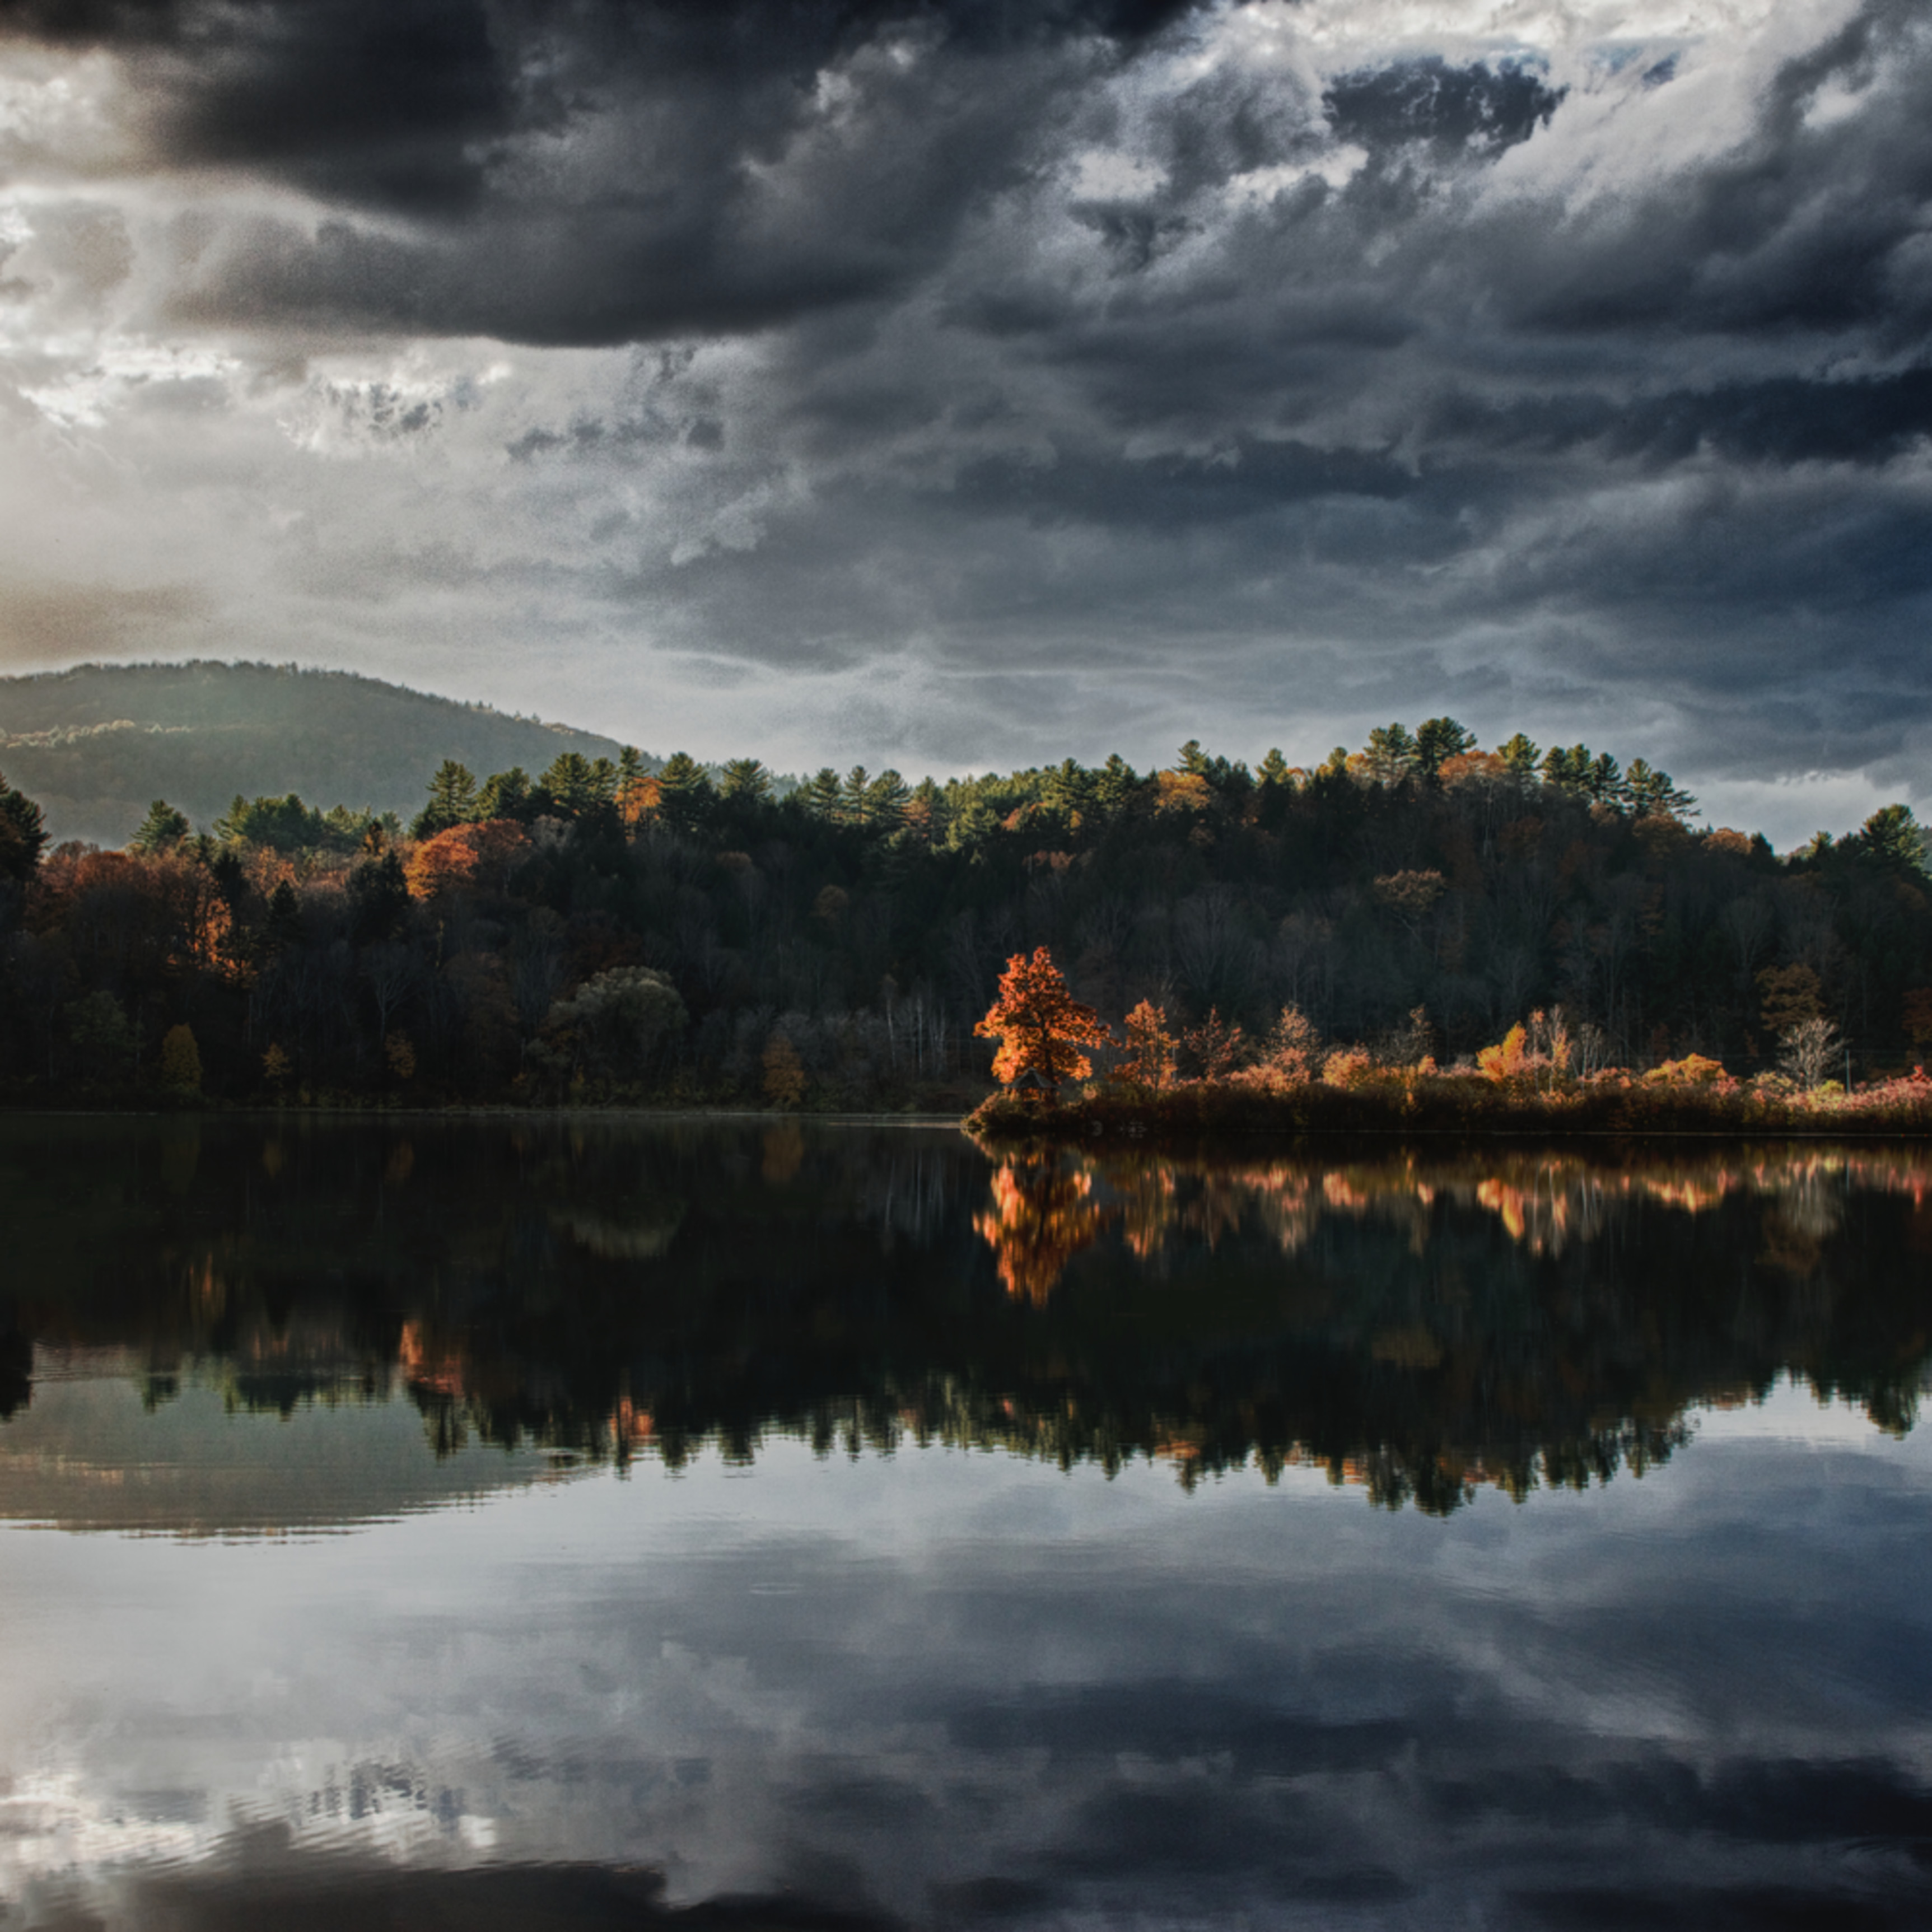 Last light of fall ggyl2t